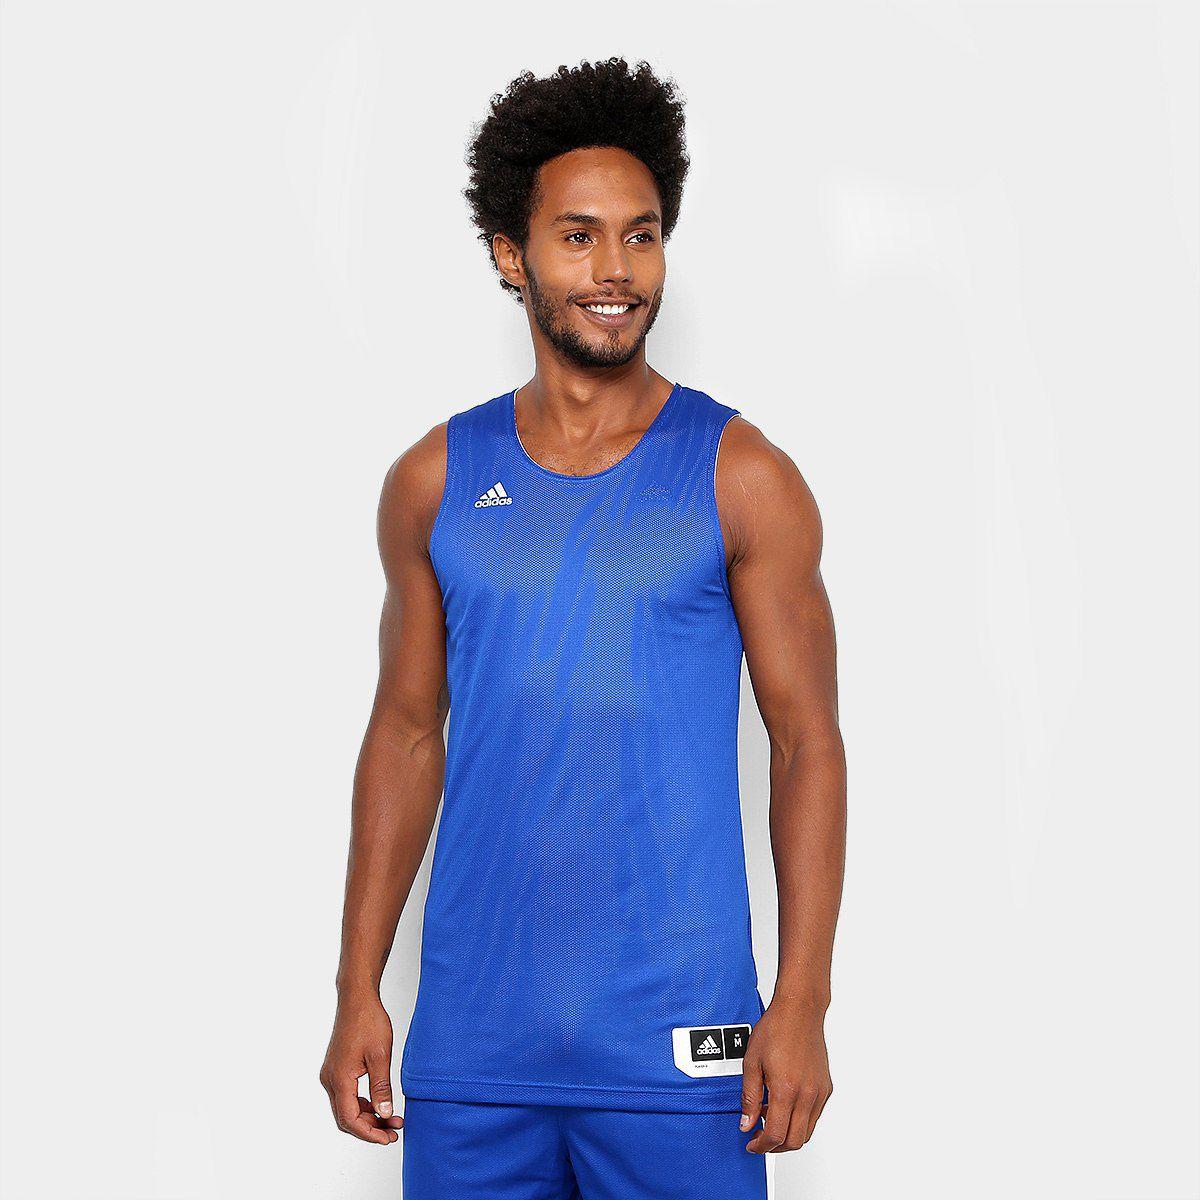 956f89ddd0 Regata Adidas Treino Reversível Dupla Face Masculina - Azul e Branco -  Titanes Esportes